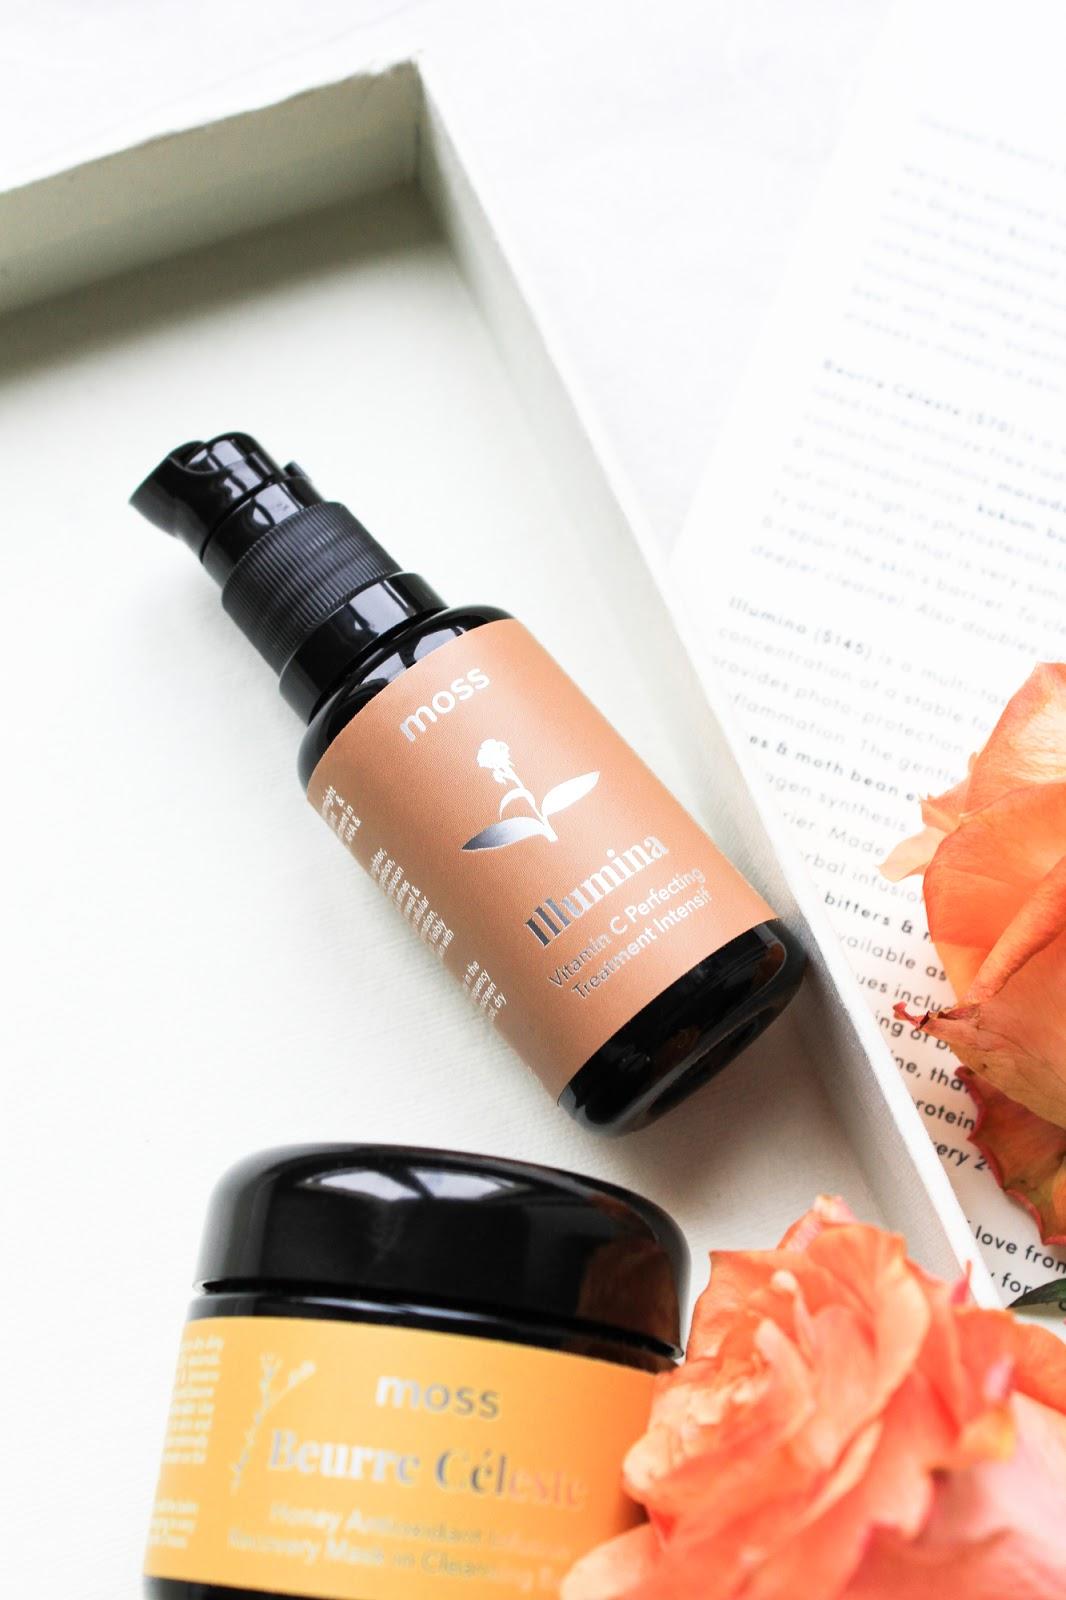 MOSS Illumina Vitamin C Perfecting Treatment Intensif. Beurre Céleste Honey Antioxidant Infusion Recovery Mask in Cleansing Baum. Boxwalla June Beauty Box 2018.